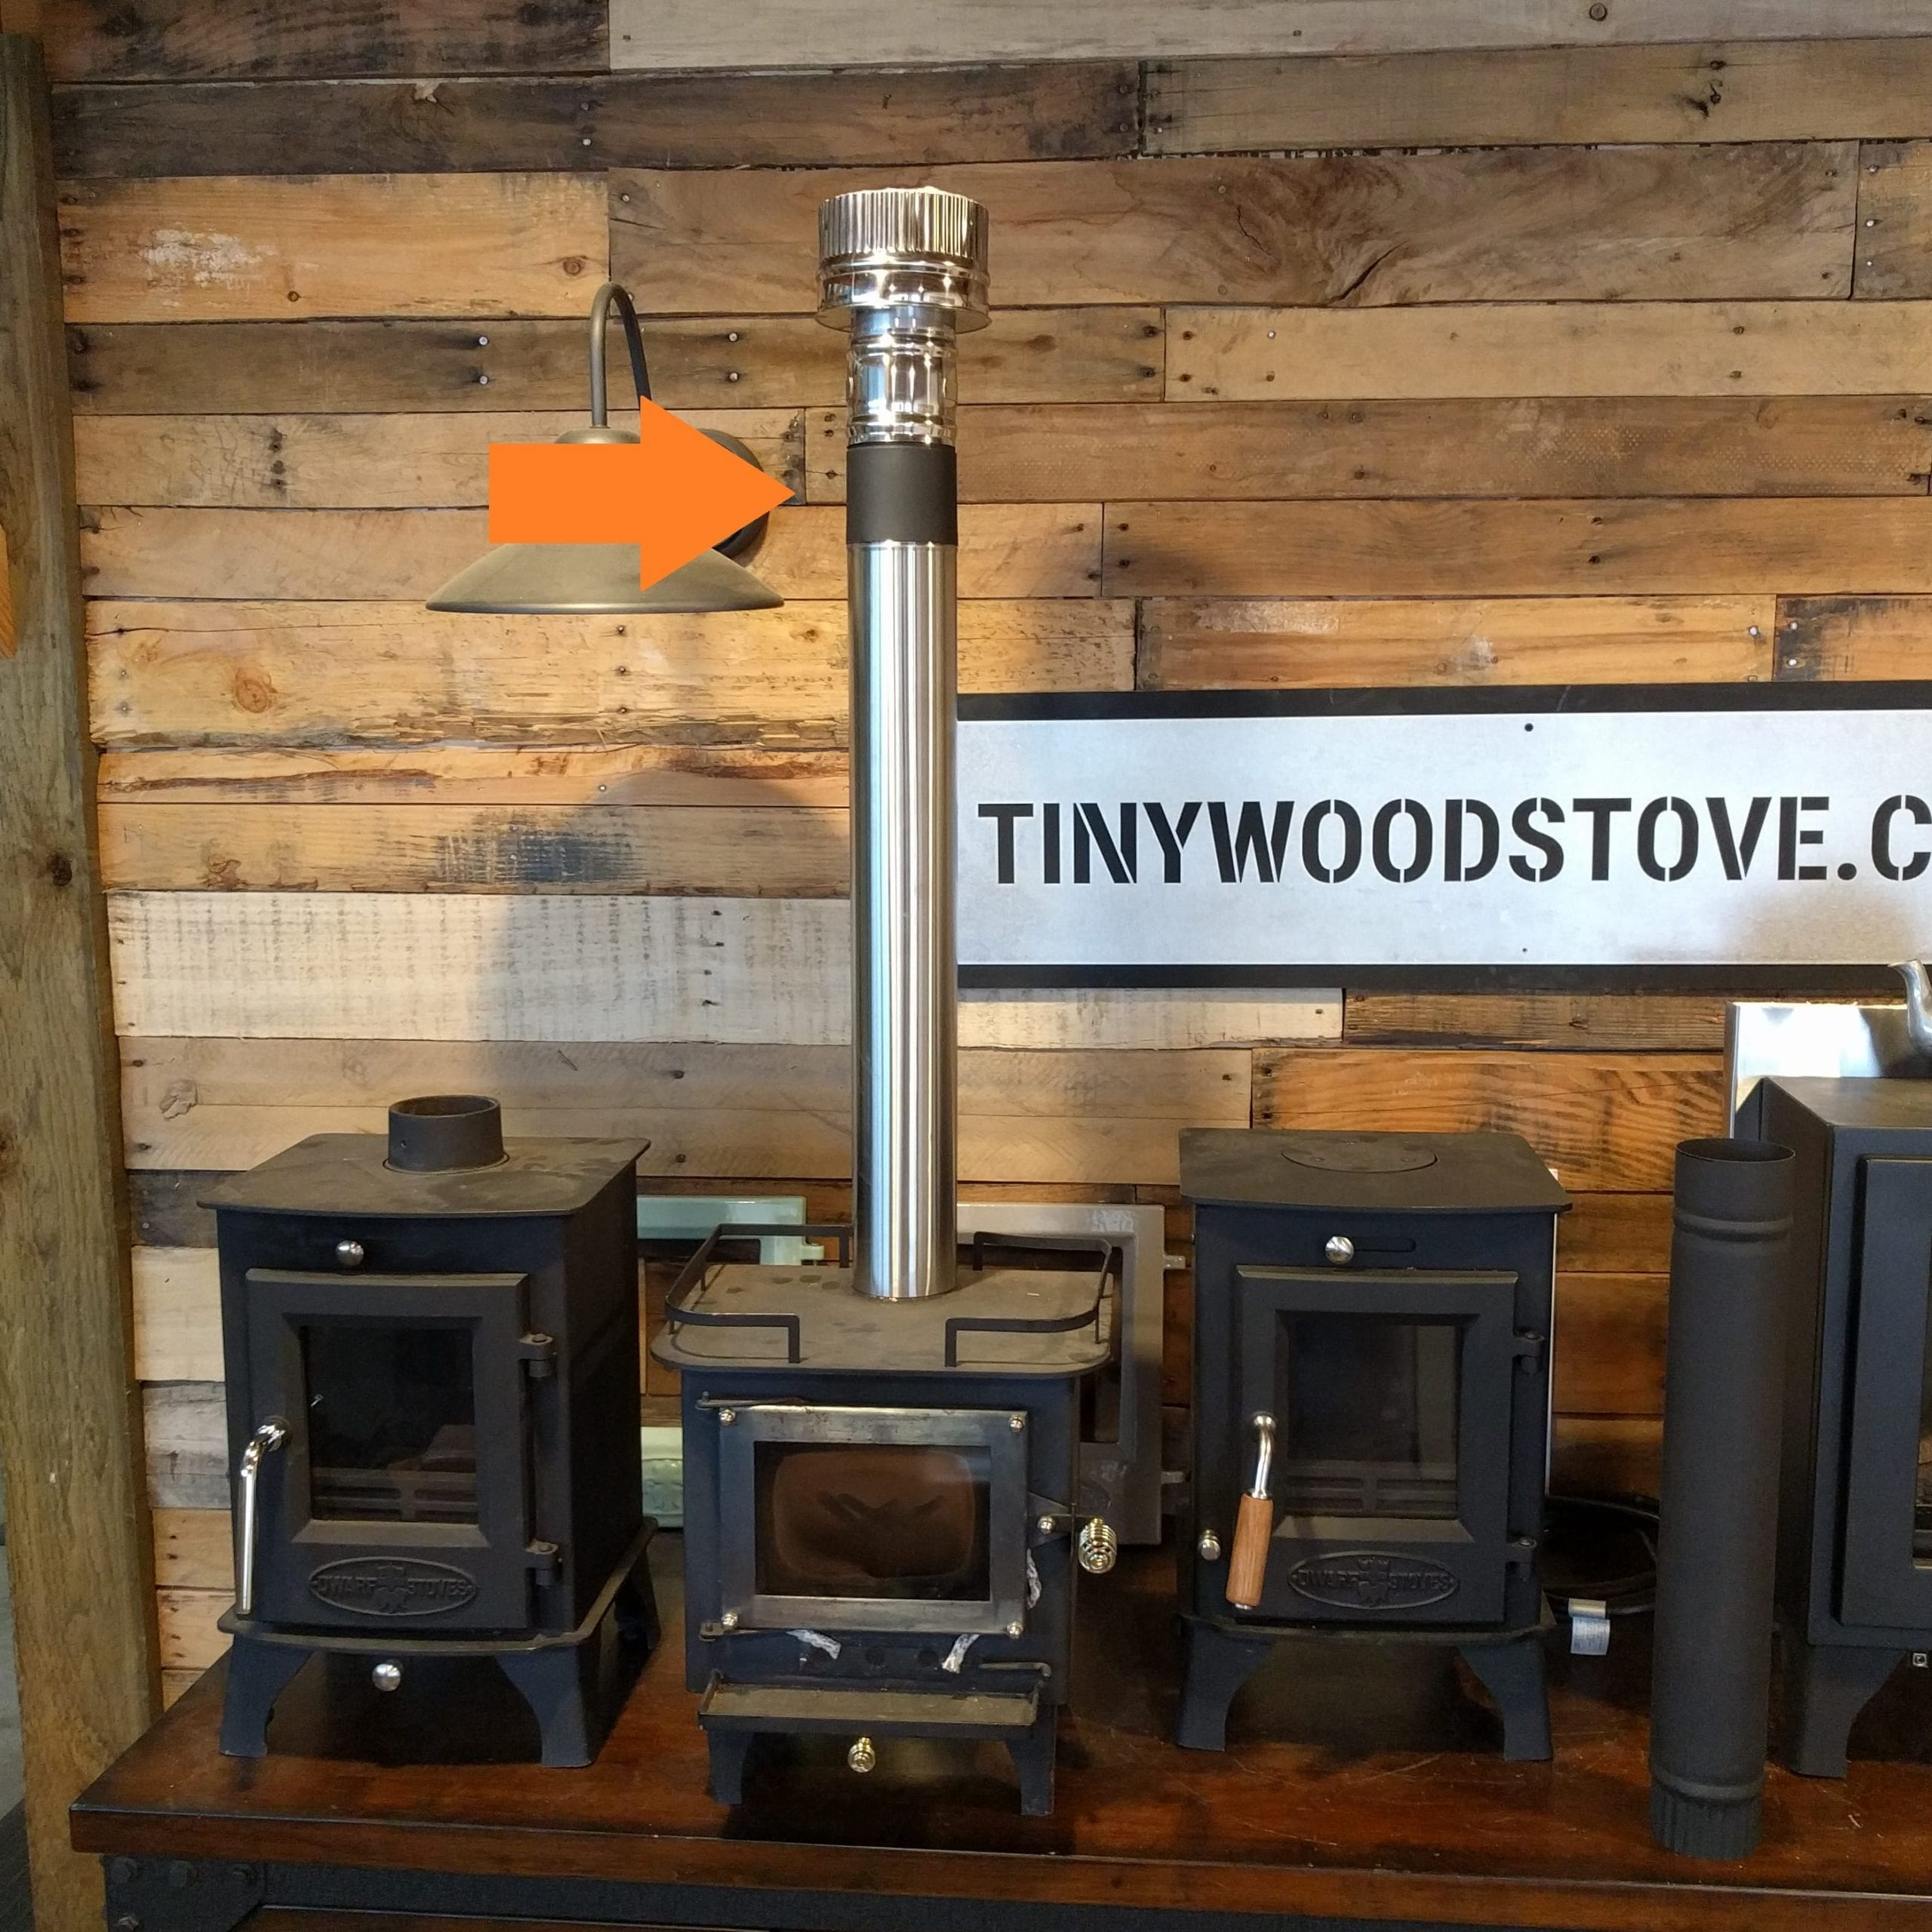 3 Cubic Mini Stove Adapter Tiny Wood Stove